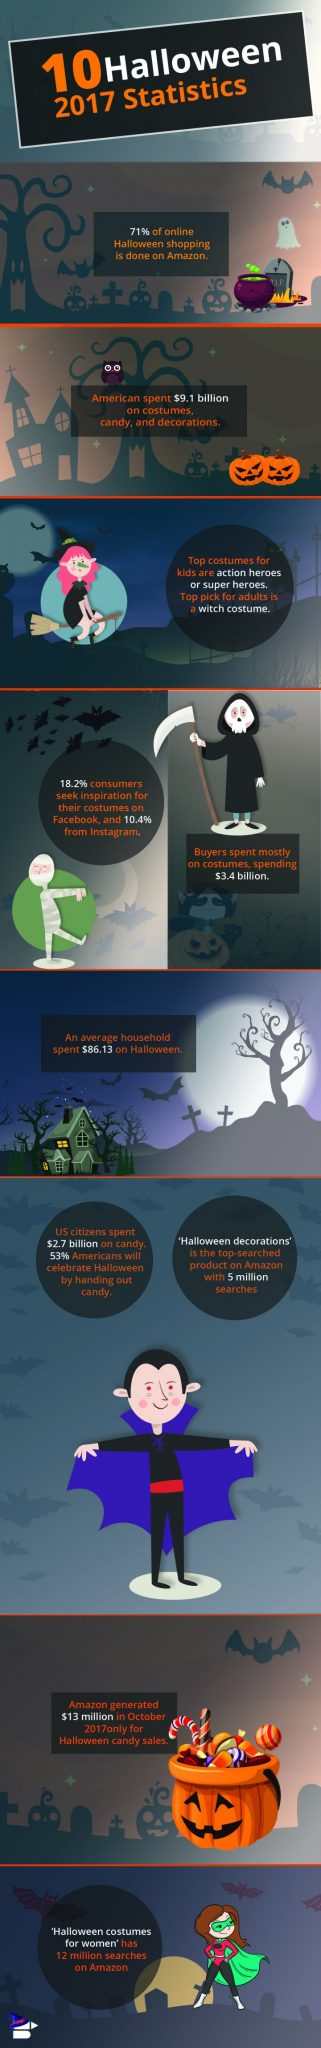 Halloween Stats 2017 compressed